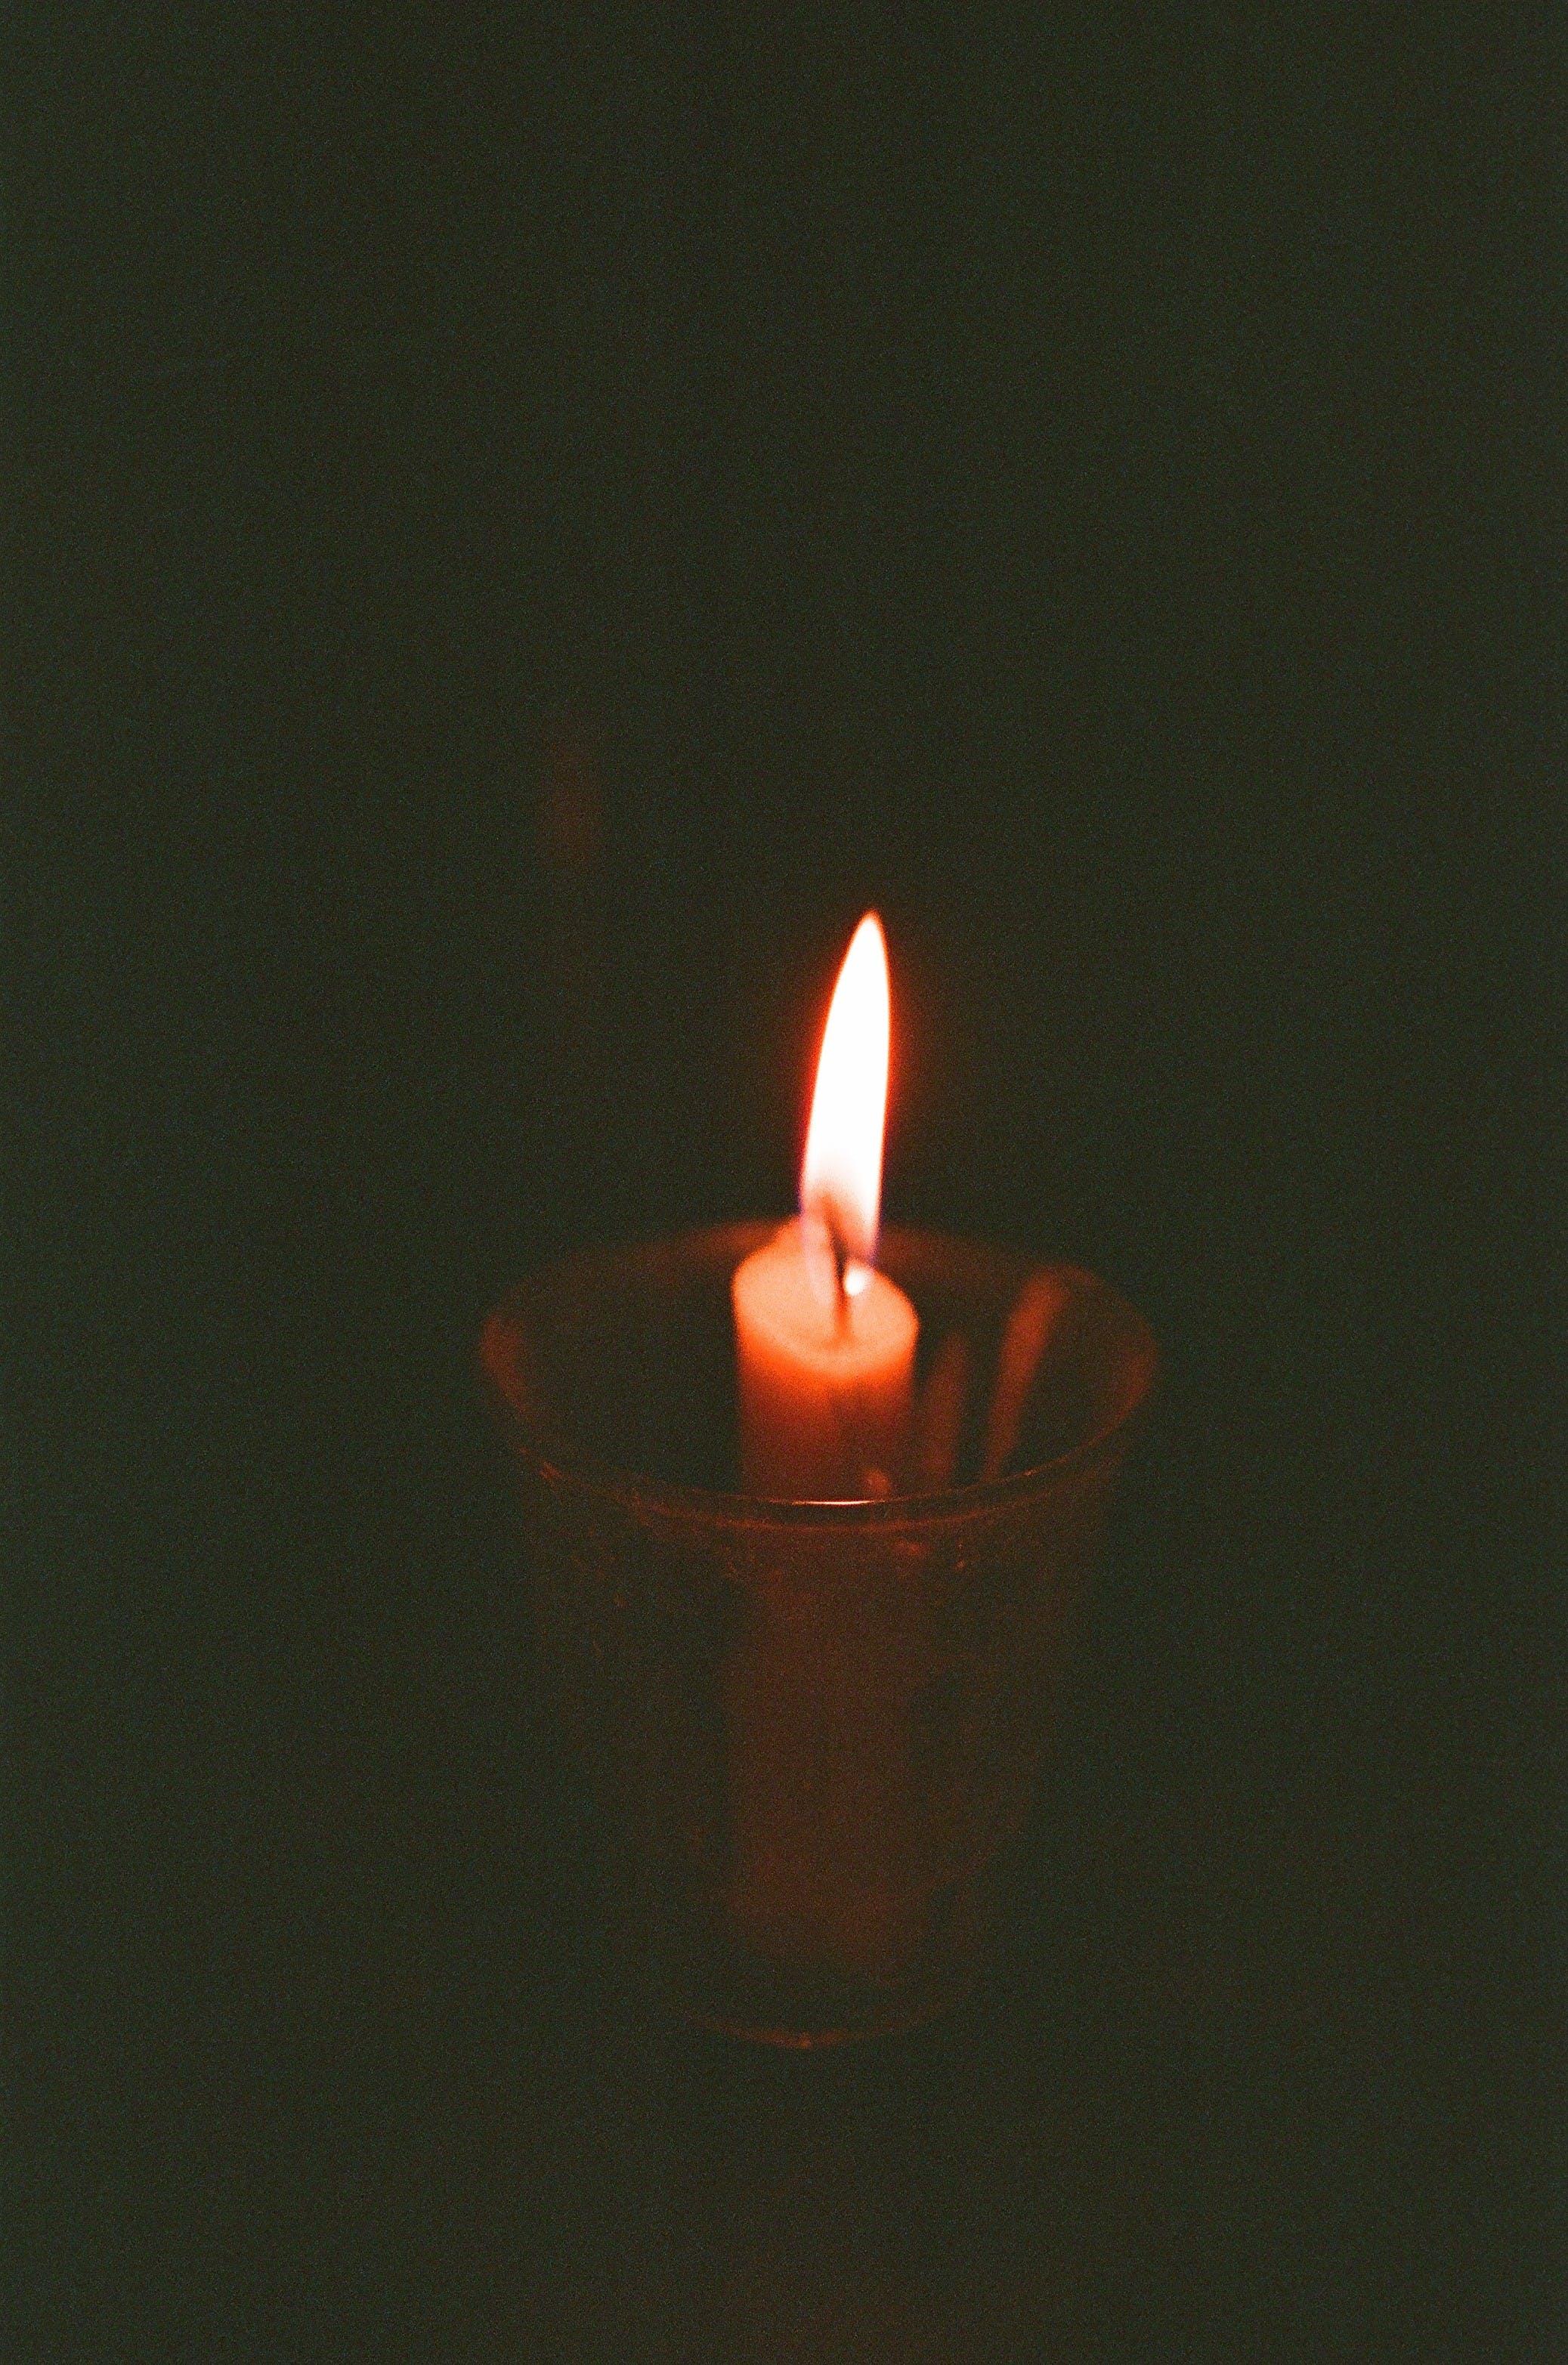 Free stock photo of analog camera, candle, candlelight, film camera